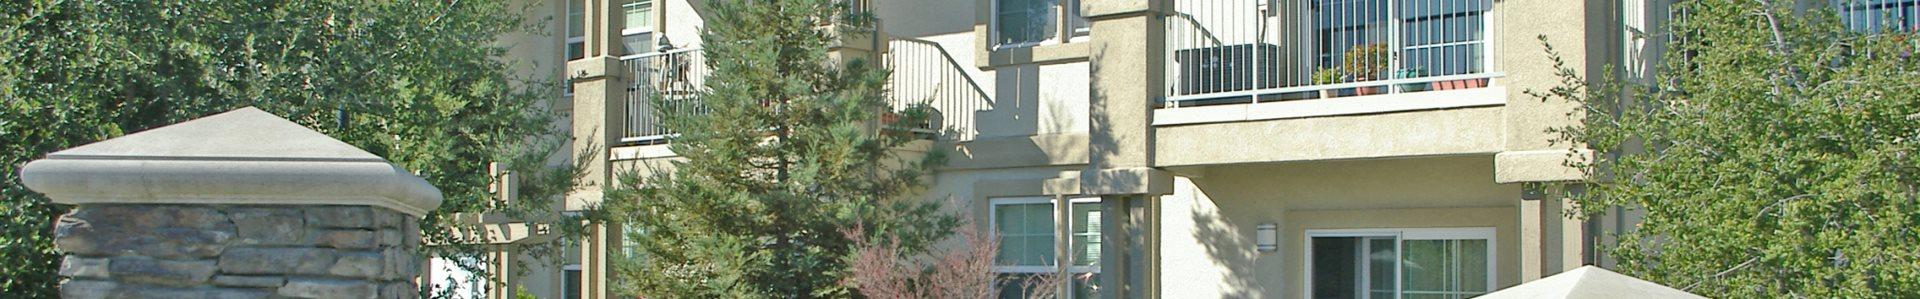 Apartment Community in Pleasanton   Gardens @ Ironwood